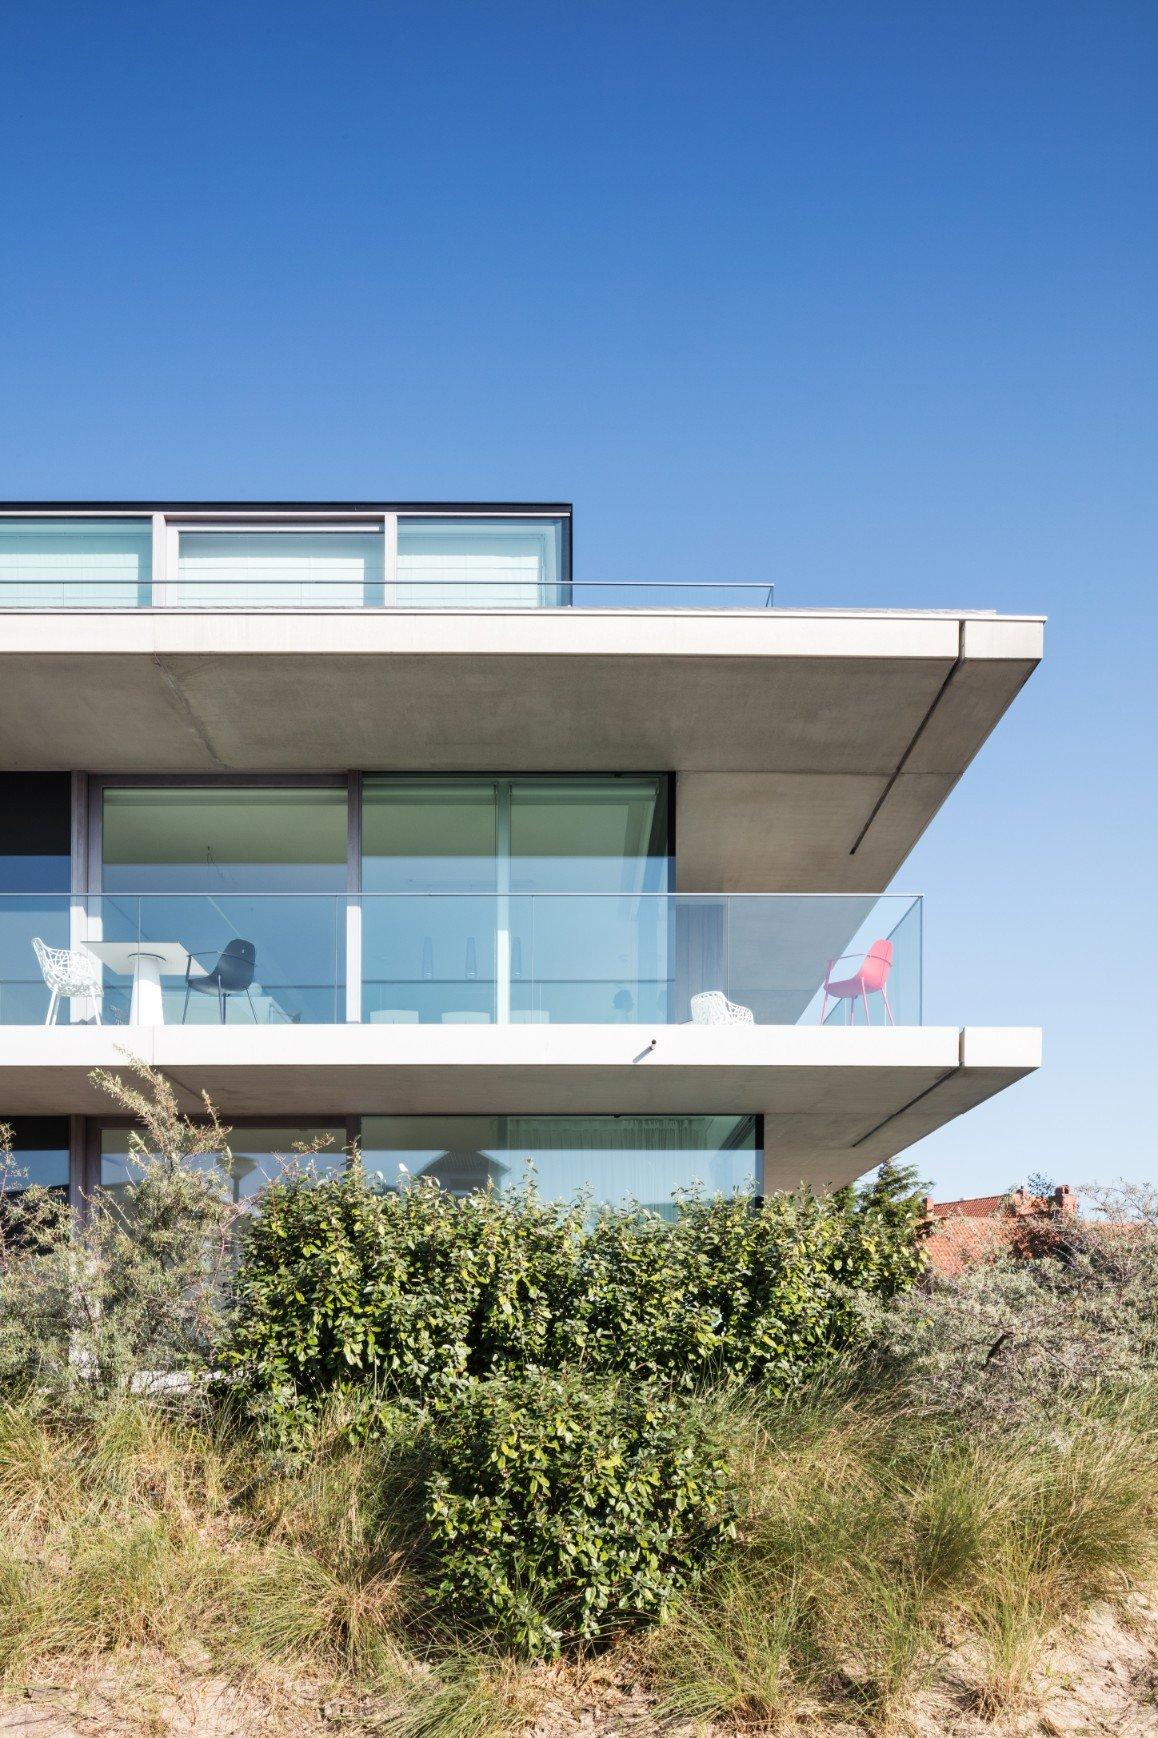 Rietveldprojects.be-Twins-Gropius-Breuer-appartement-design-architectuur-kust8